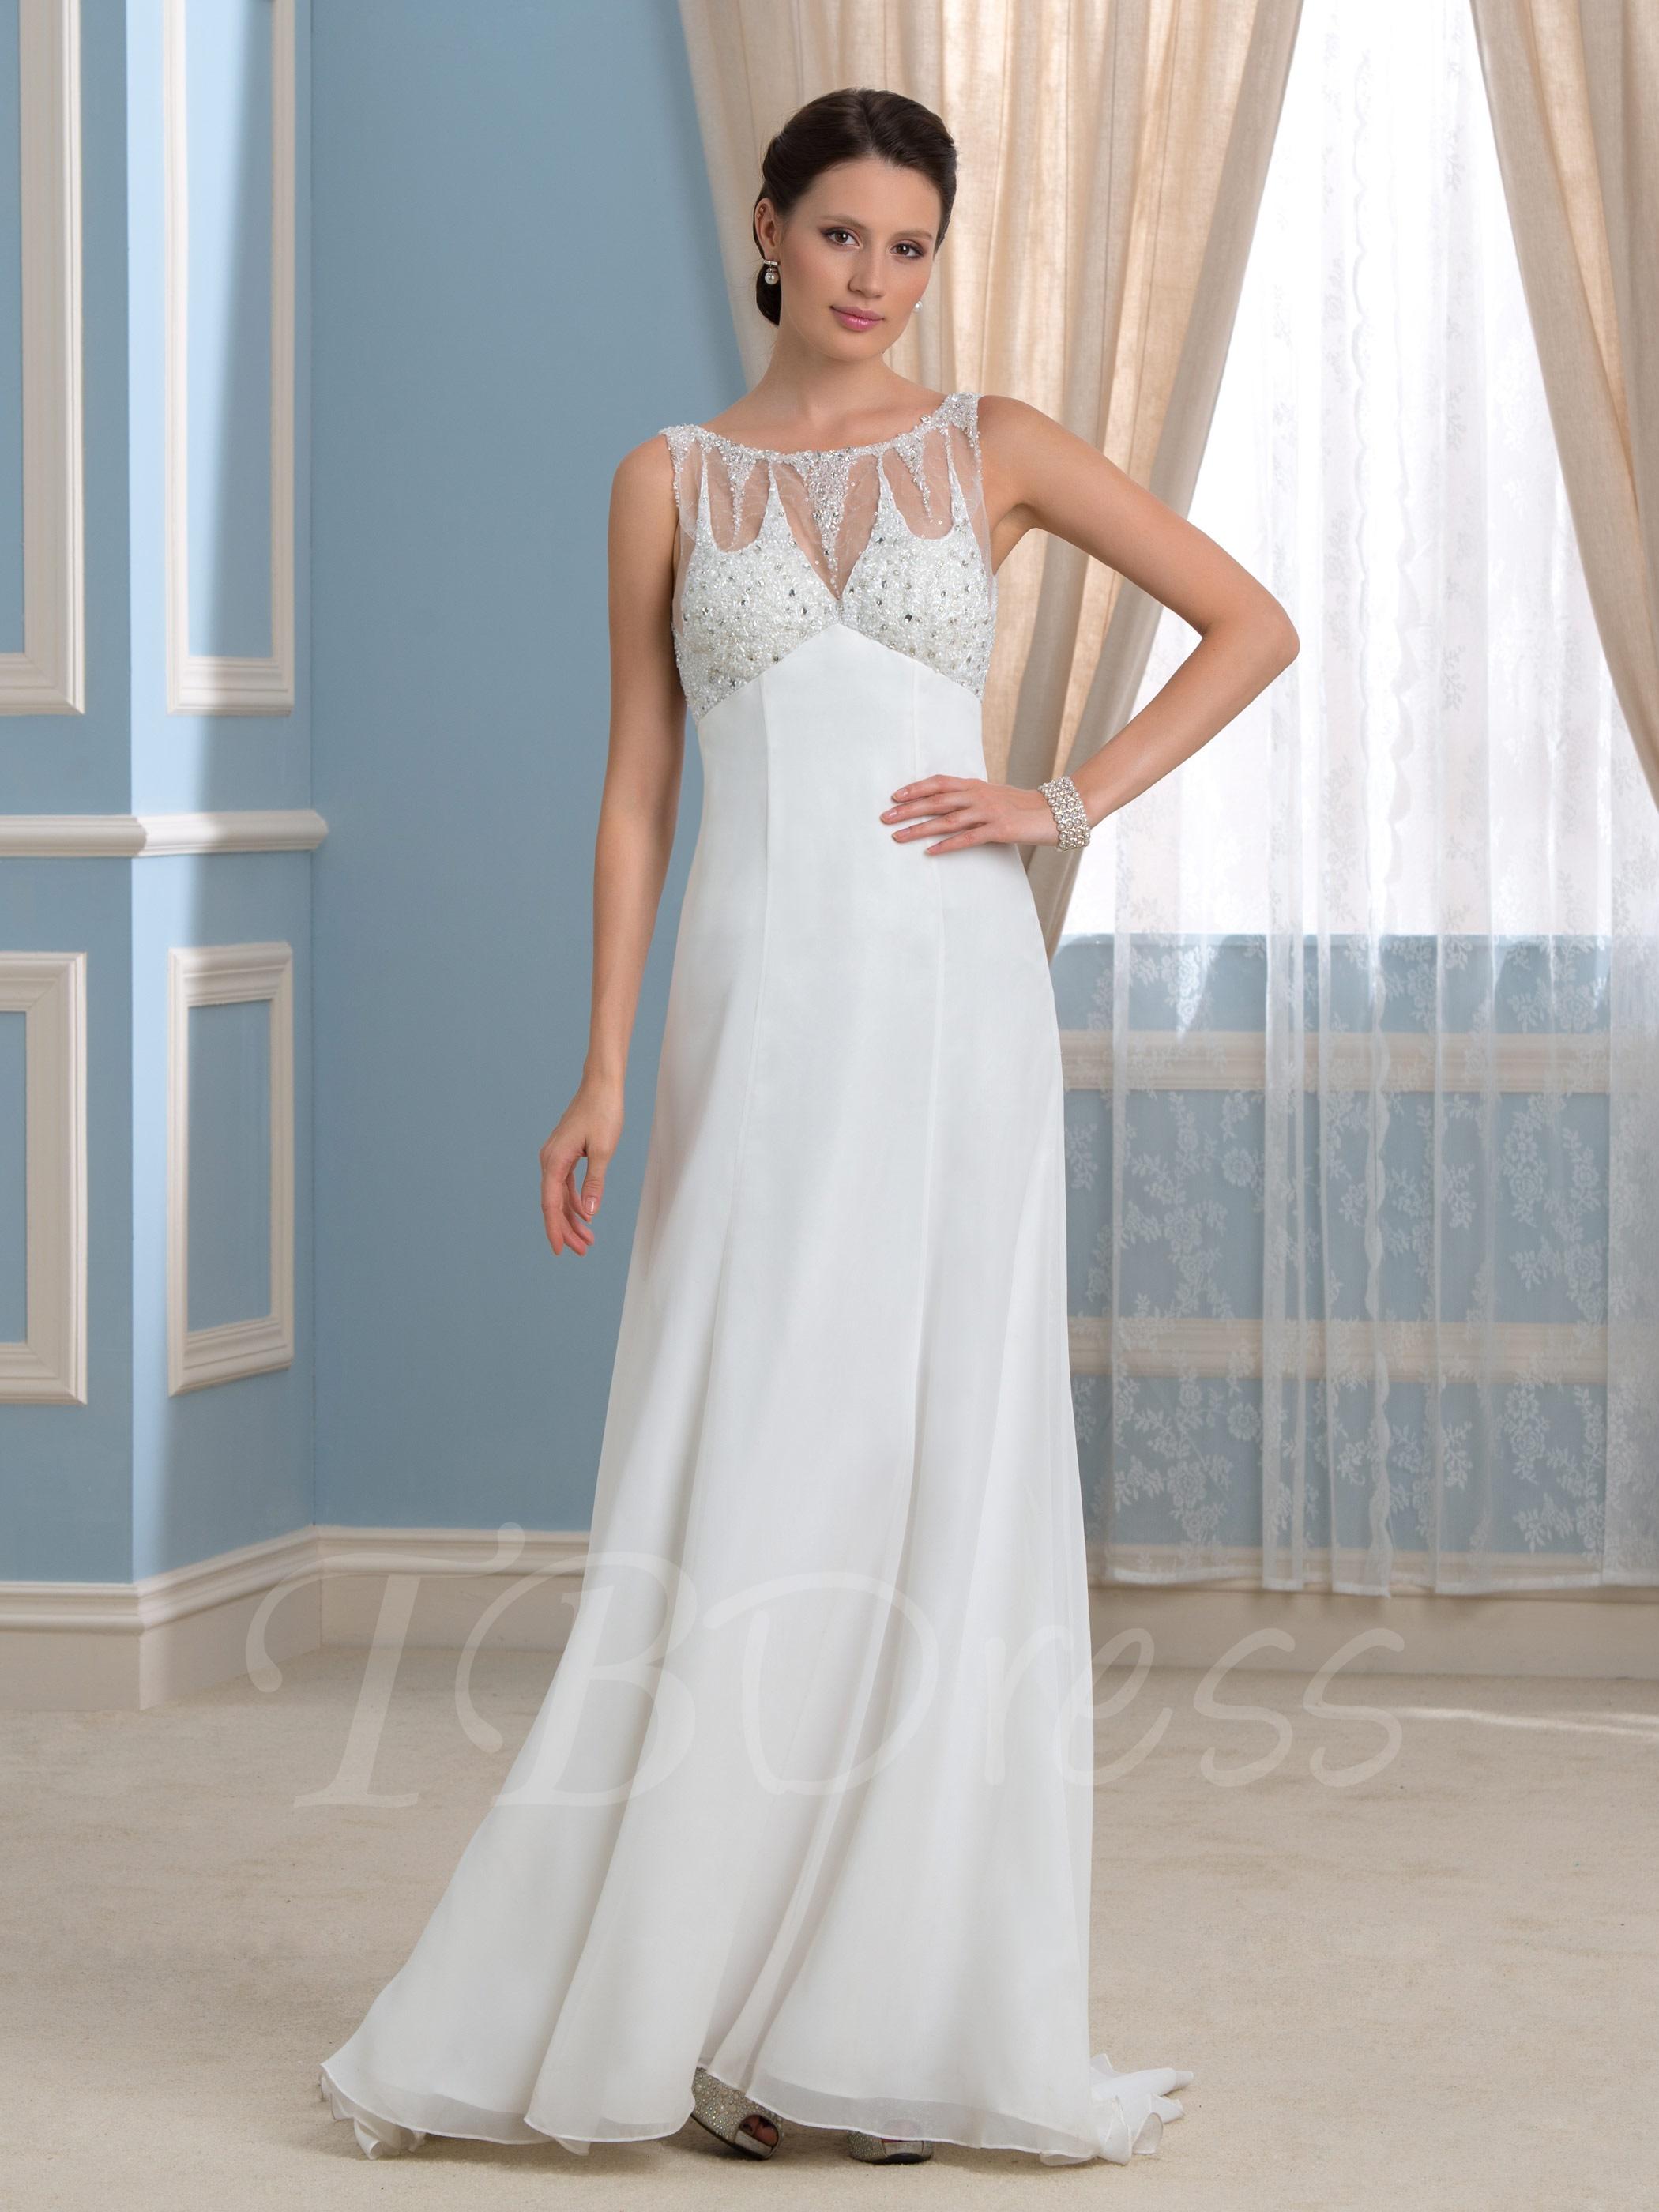 empire wedding dresses photo - 1